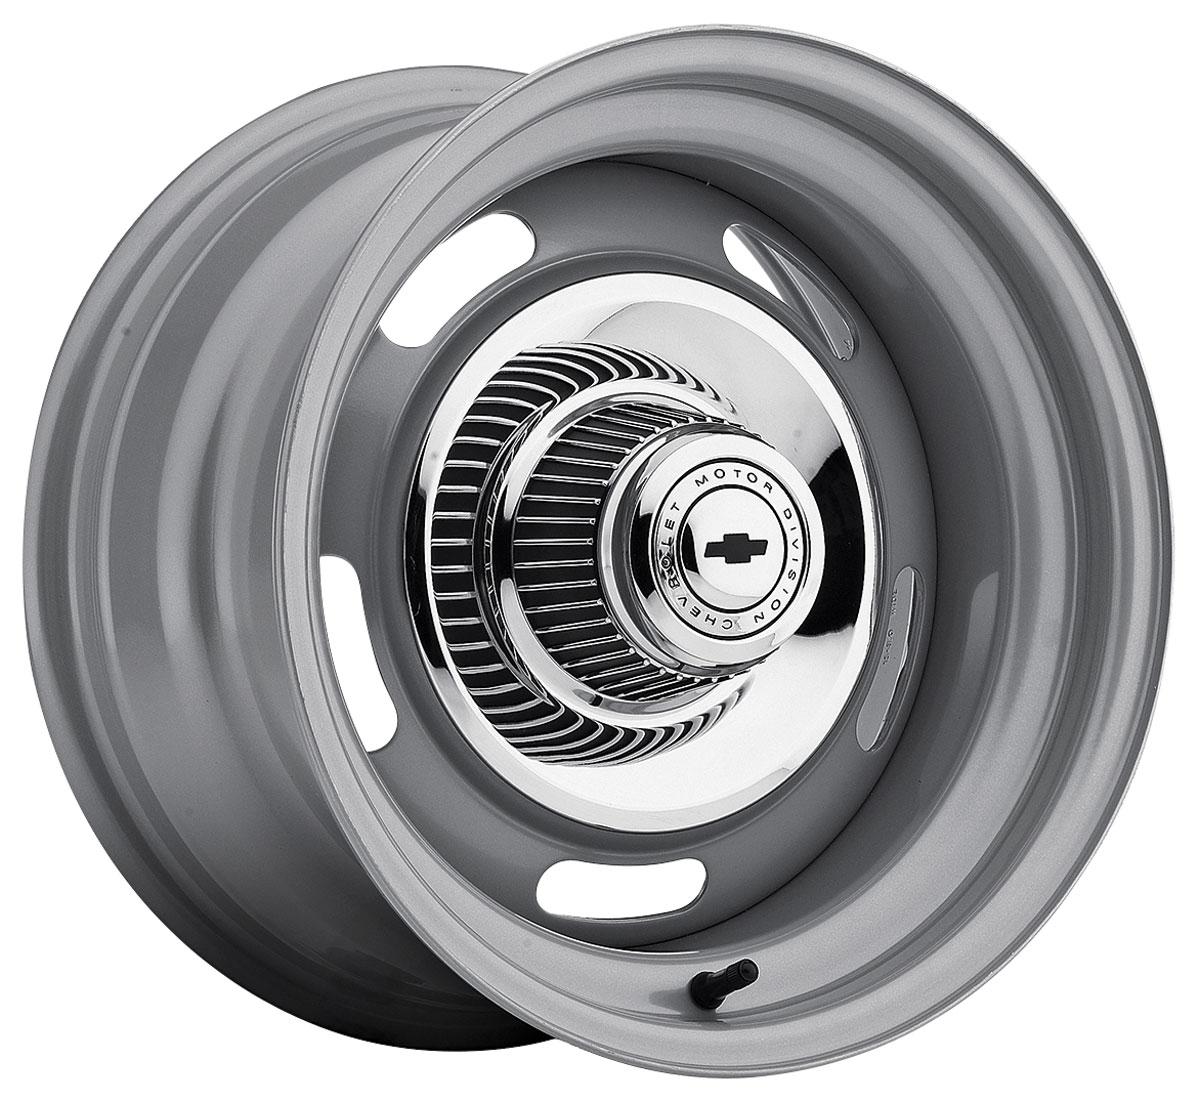 "Rally Wheel, Silver, 15"" X 8"", 4-1/4"" Backspacing"